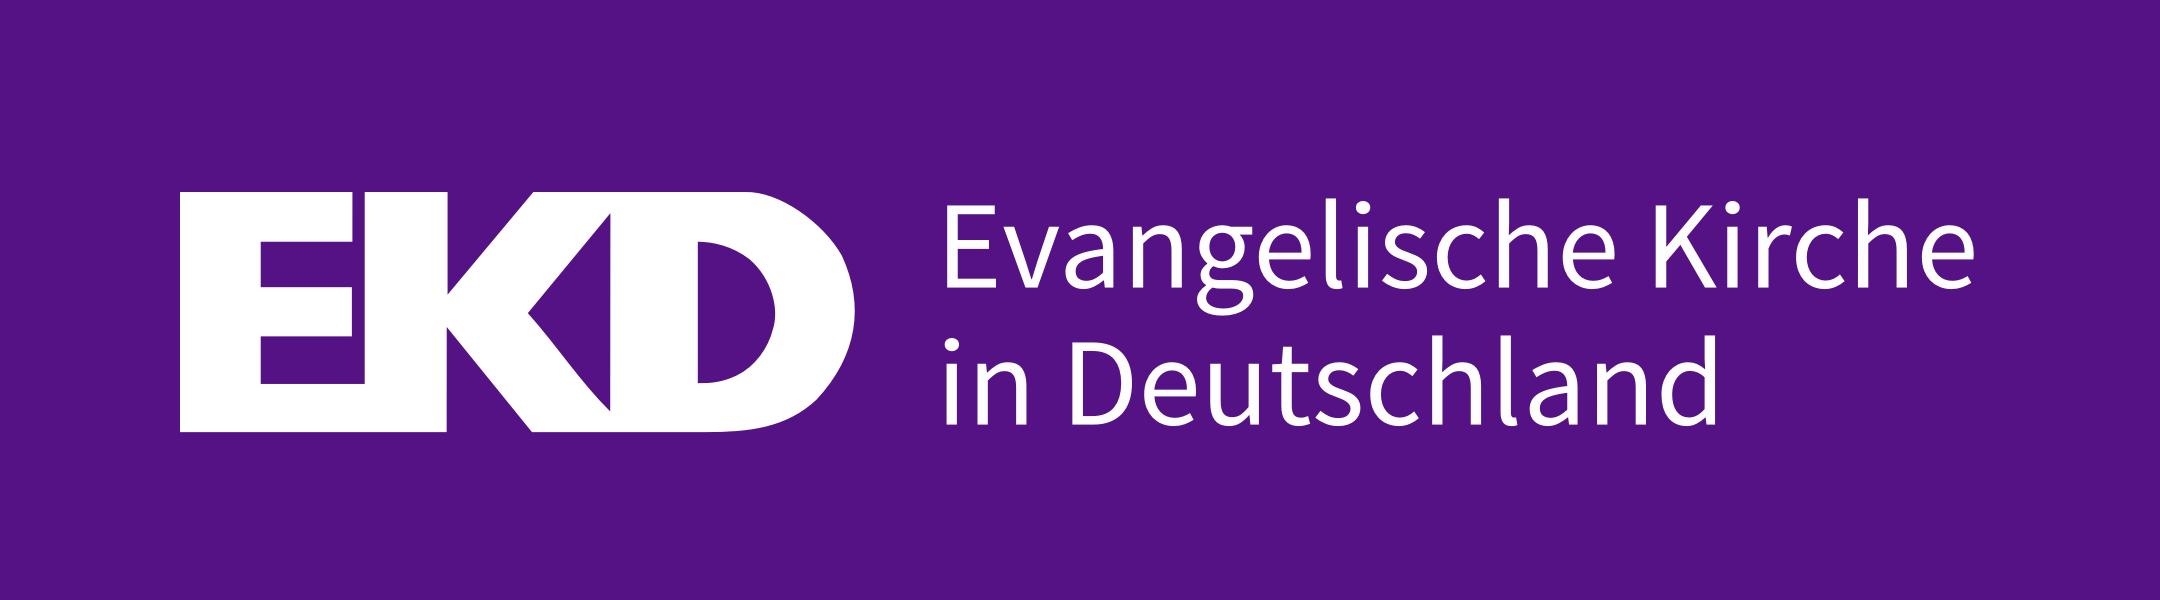 EKD-Fachforum Inklusive Kirche gestalten 2021